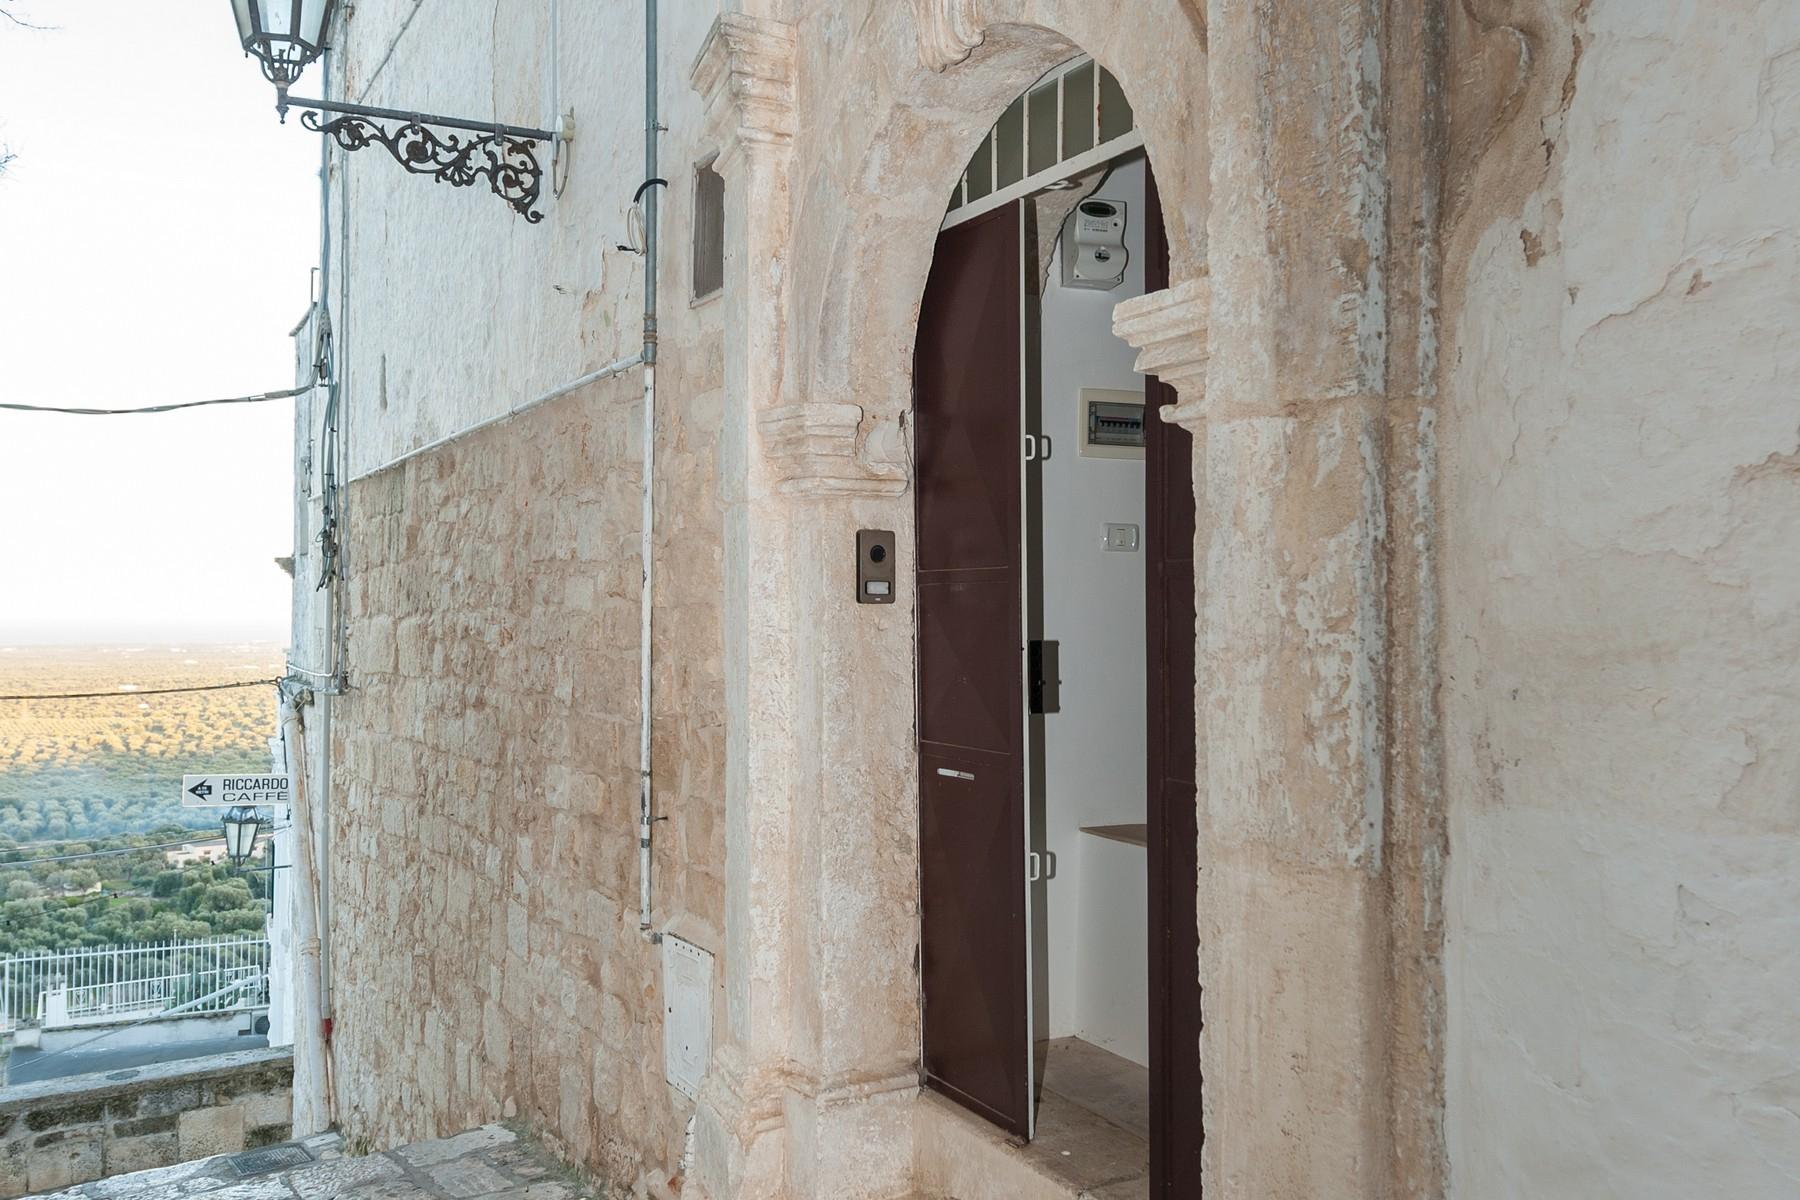 Appartamento in Vendita a Ostuni: 5 locali, 265 mq - Foto 30